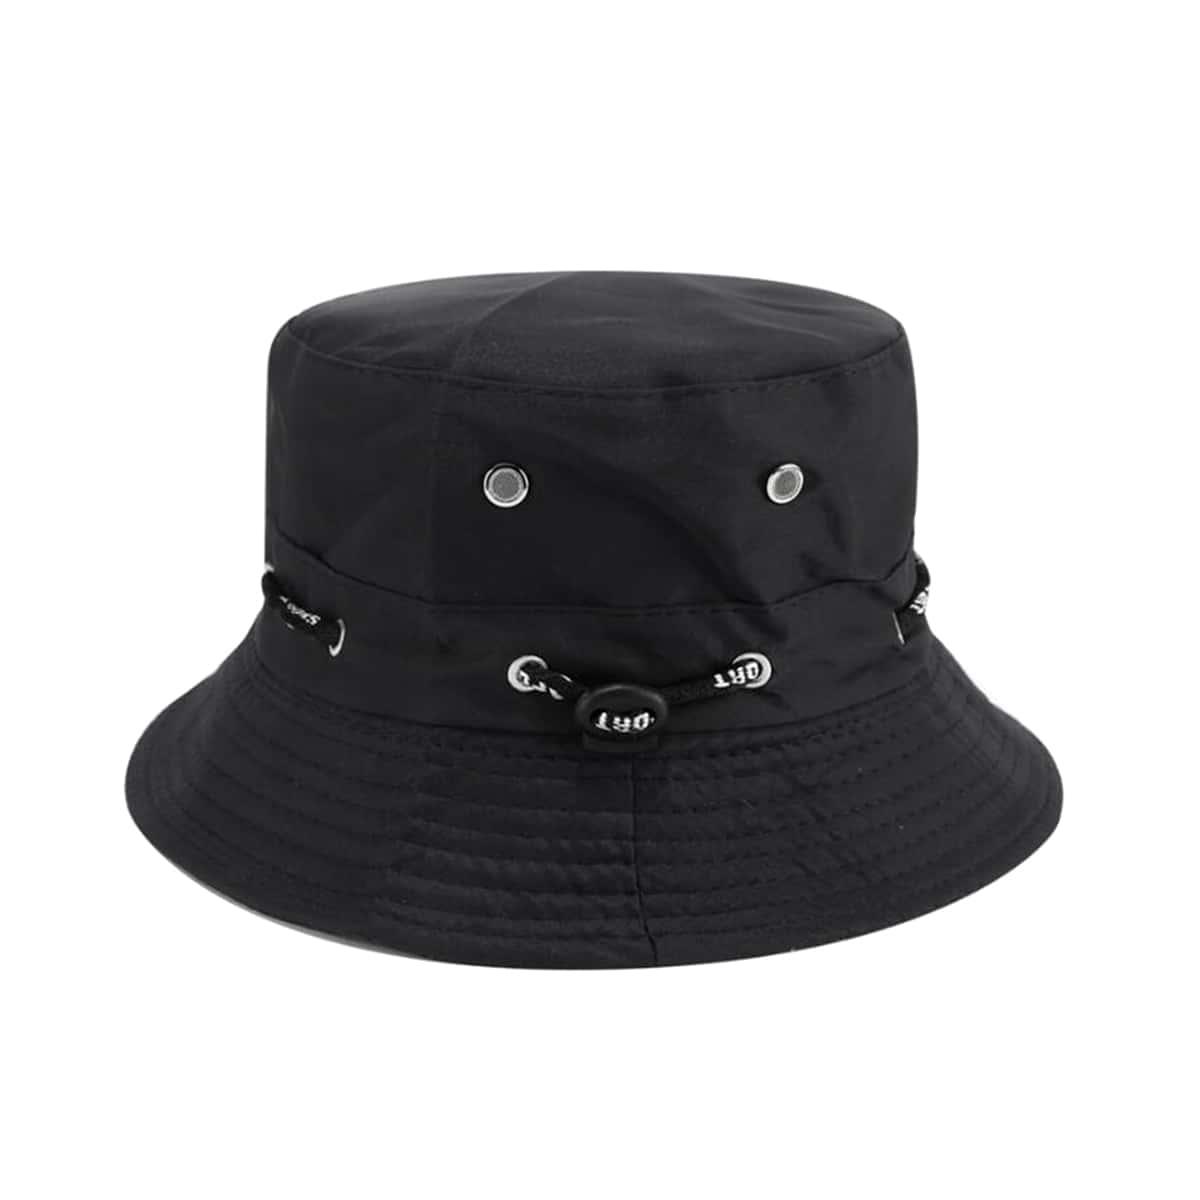 Мужская шапка с декором от SHEIN